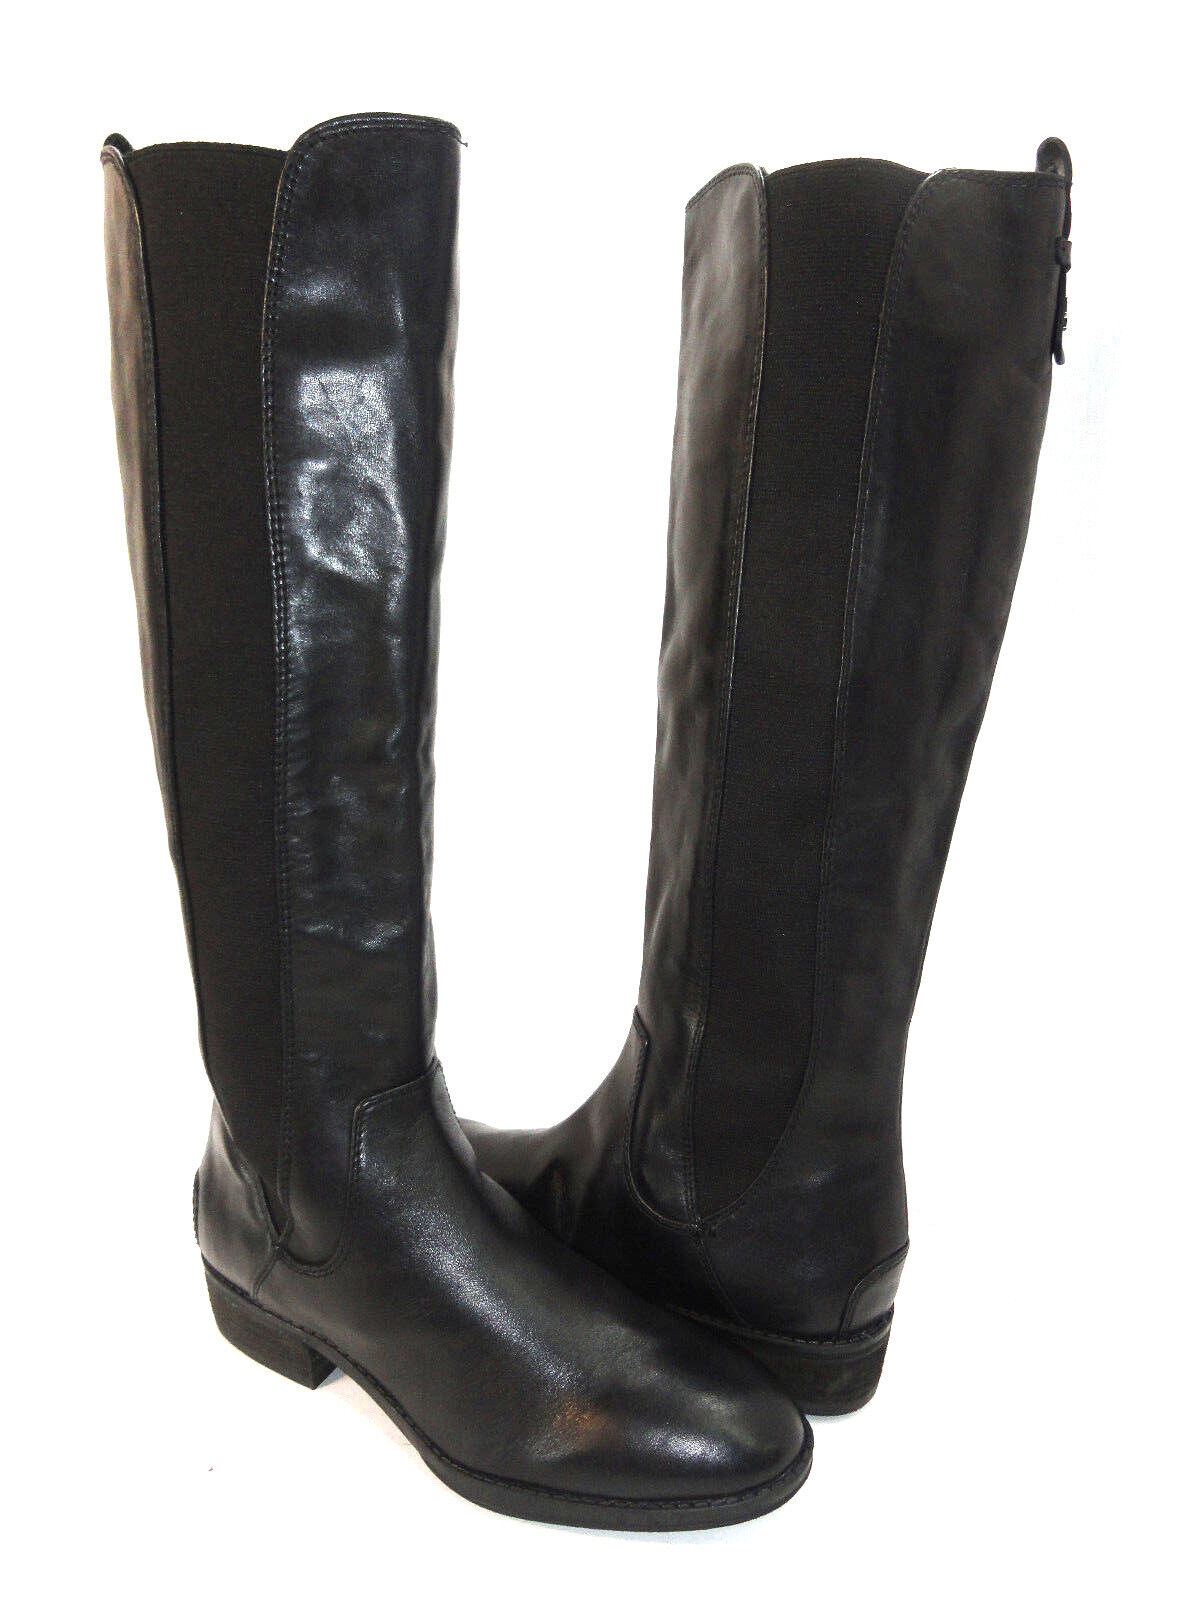 Sam Edelman Women's Rarodox Knee High Black Leather Stretch Riding Boots Size 6